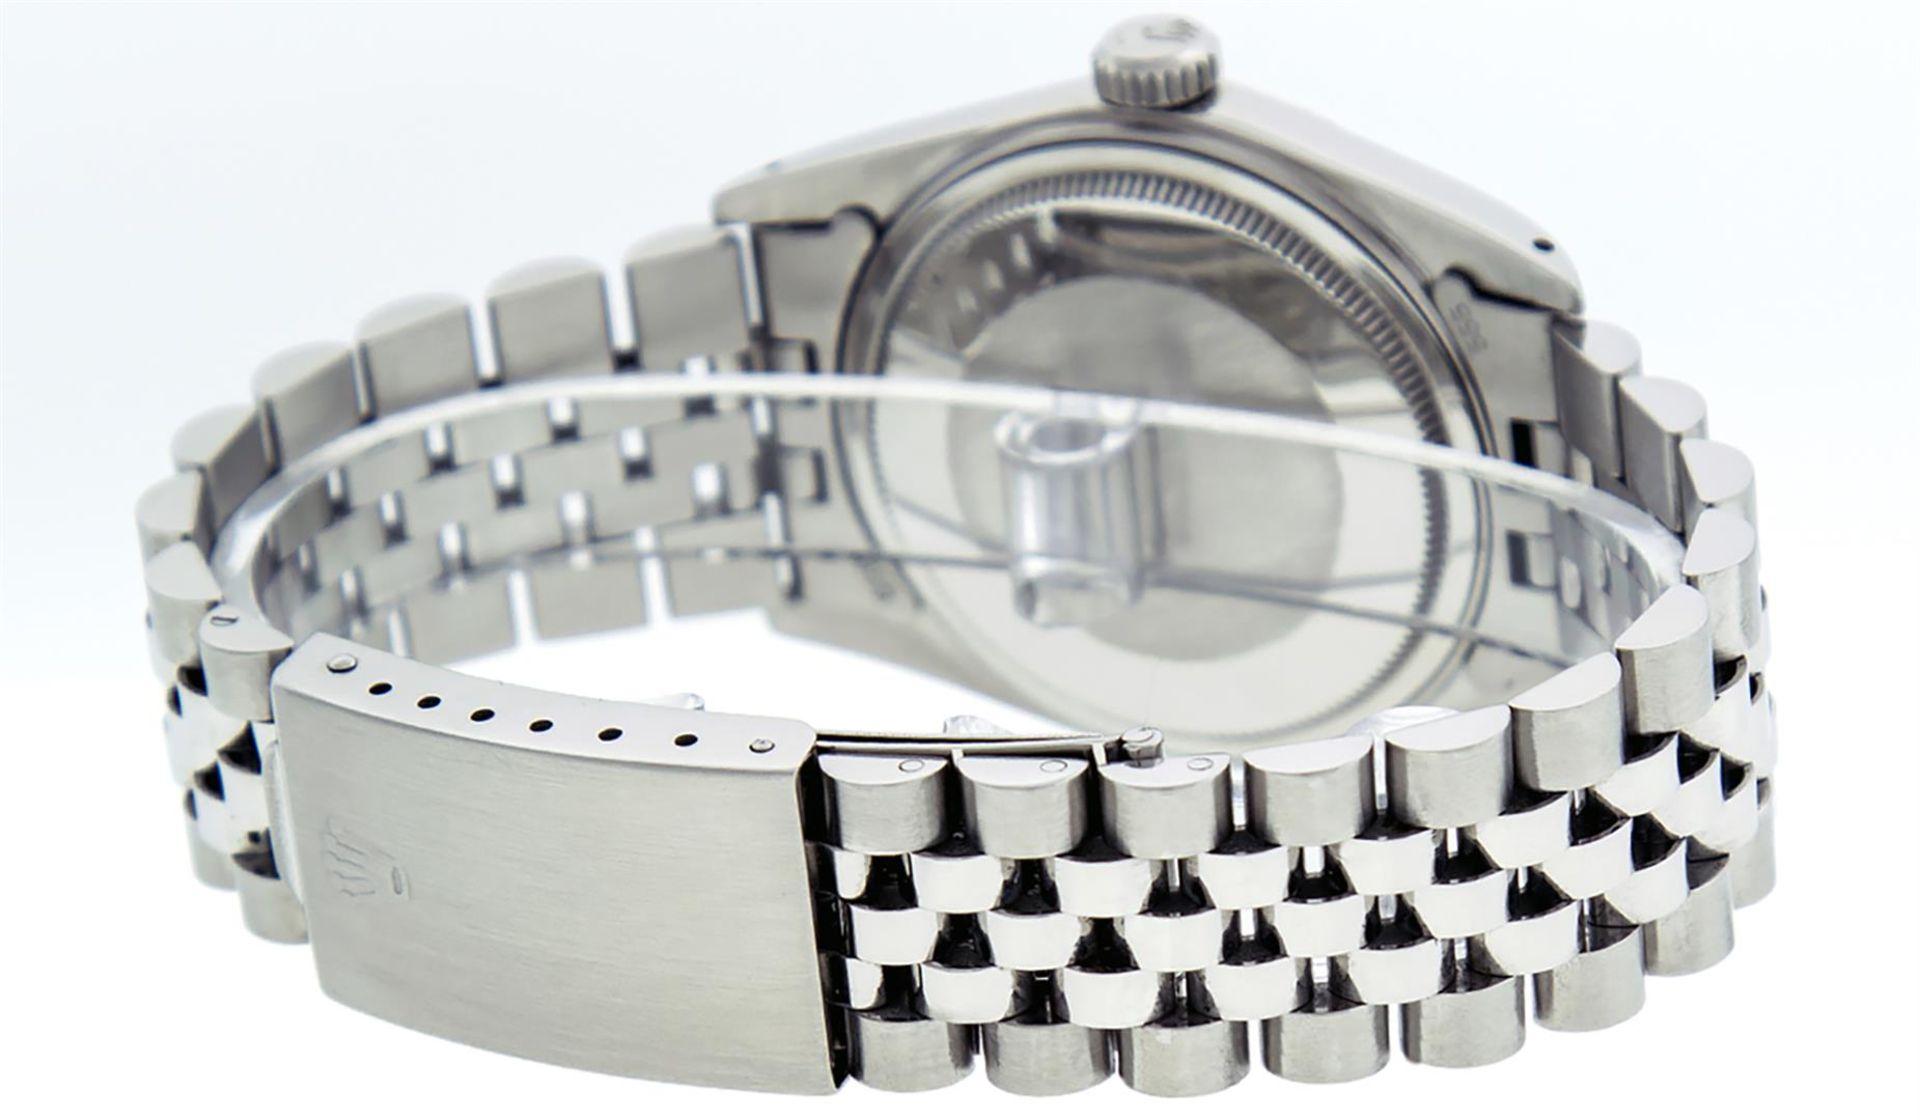 Rolex Mens Stainless Steel Ice Blue Diamond Datejust Wristwatch - Image 6 of 9